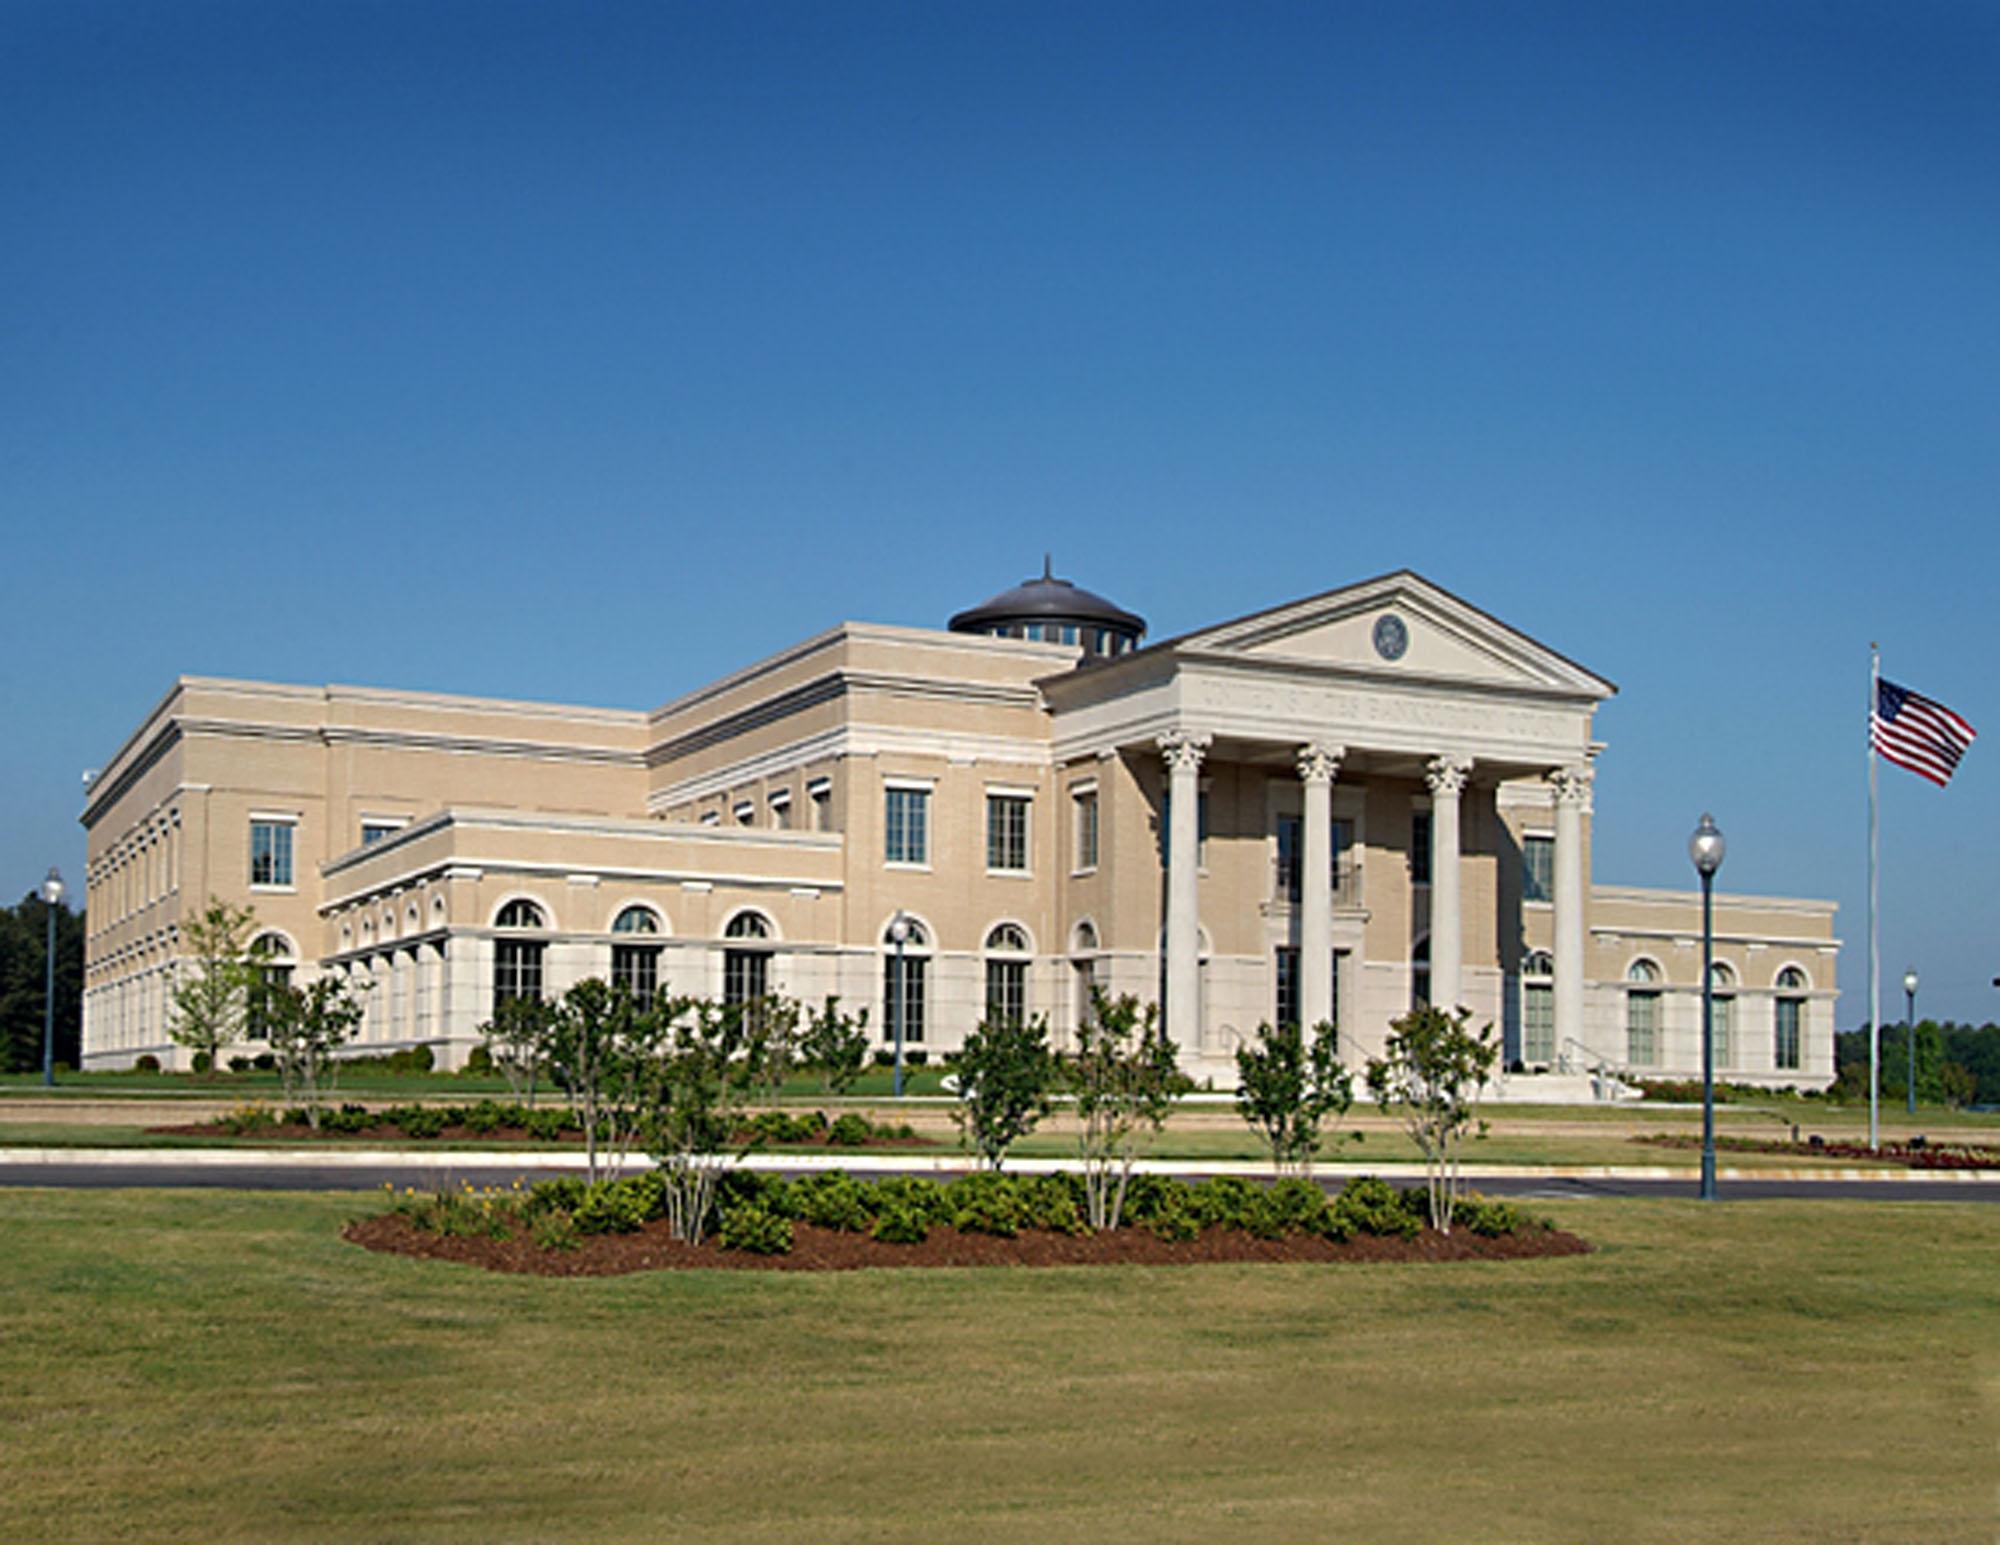 Mississippi State Mississippi United States bankruptcy bidding training